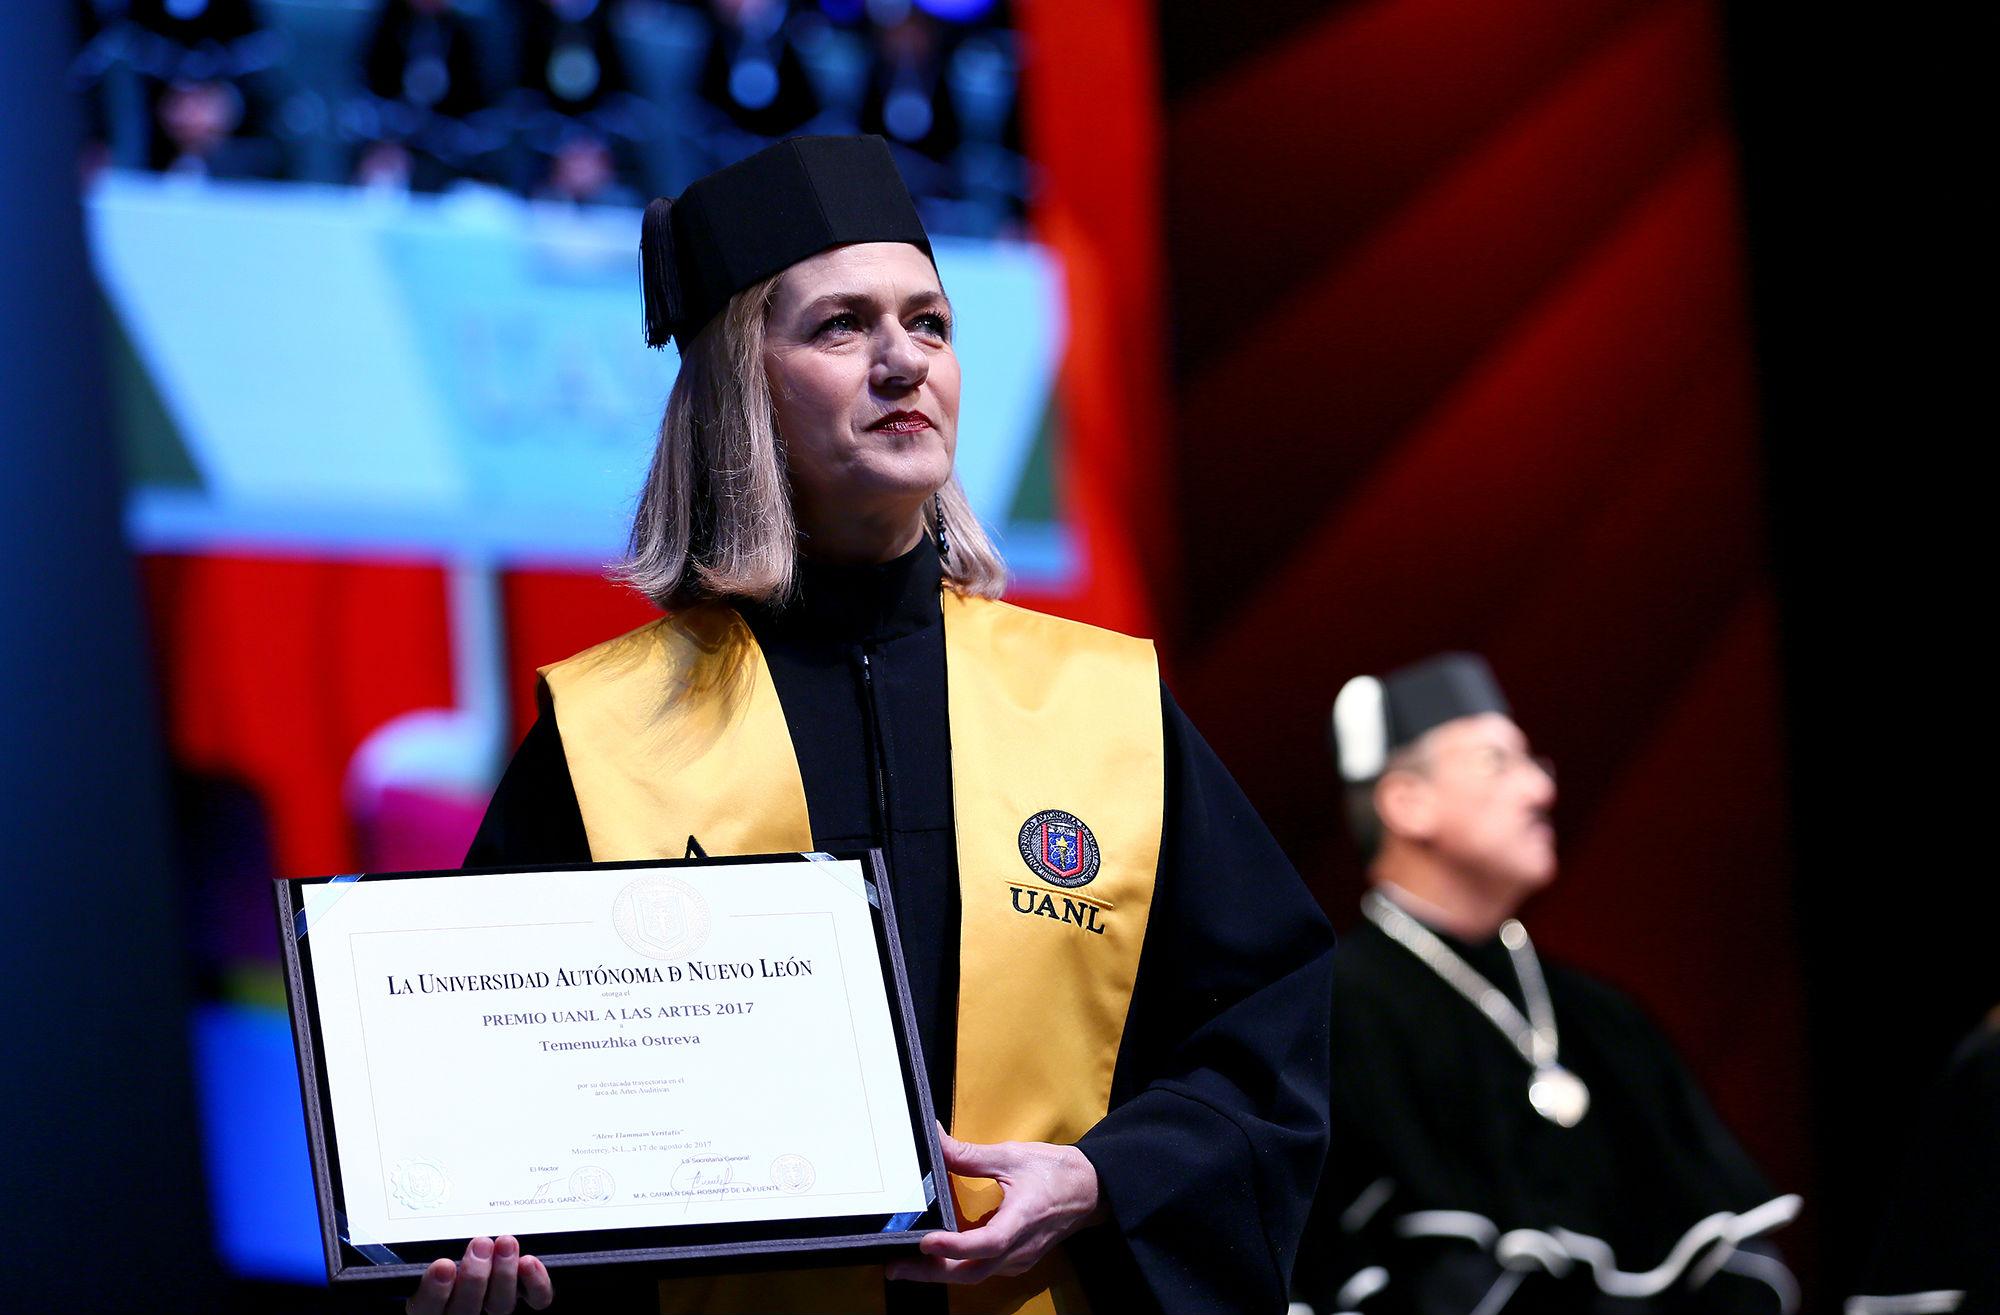 Temenuzhka Ostreva impartirá la charla